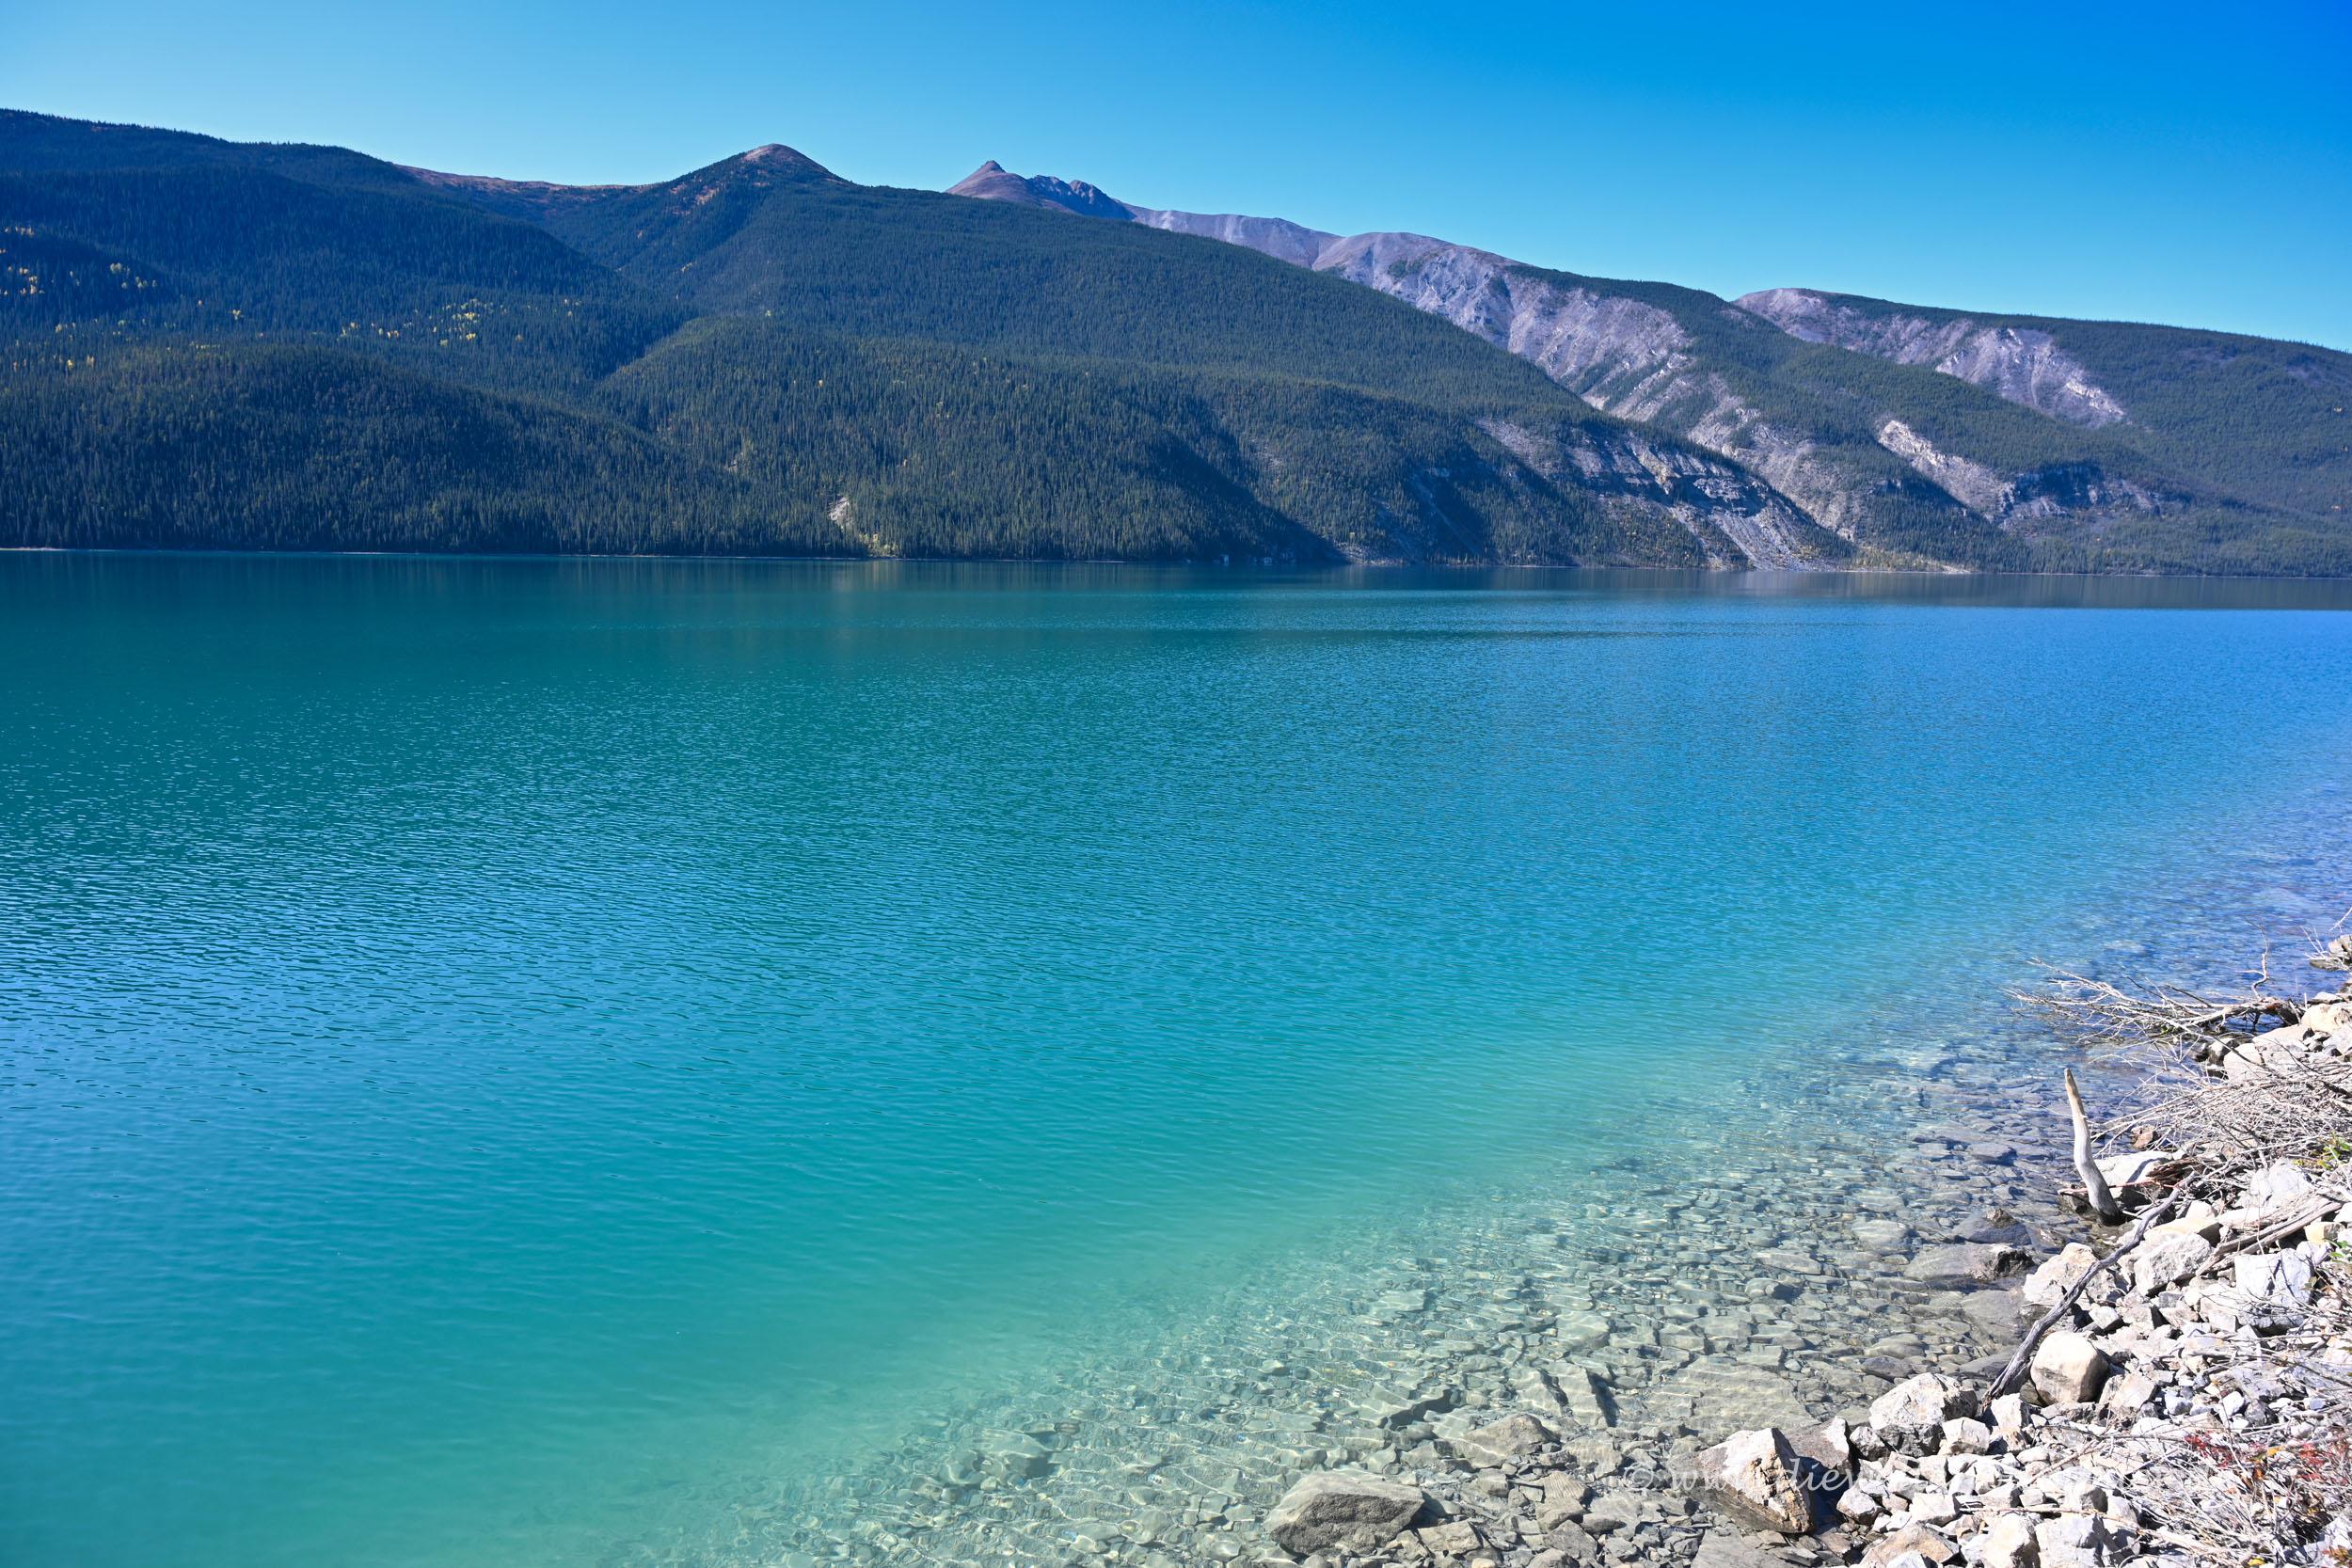 Schöner Muncho Lake